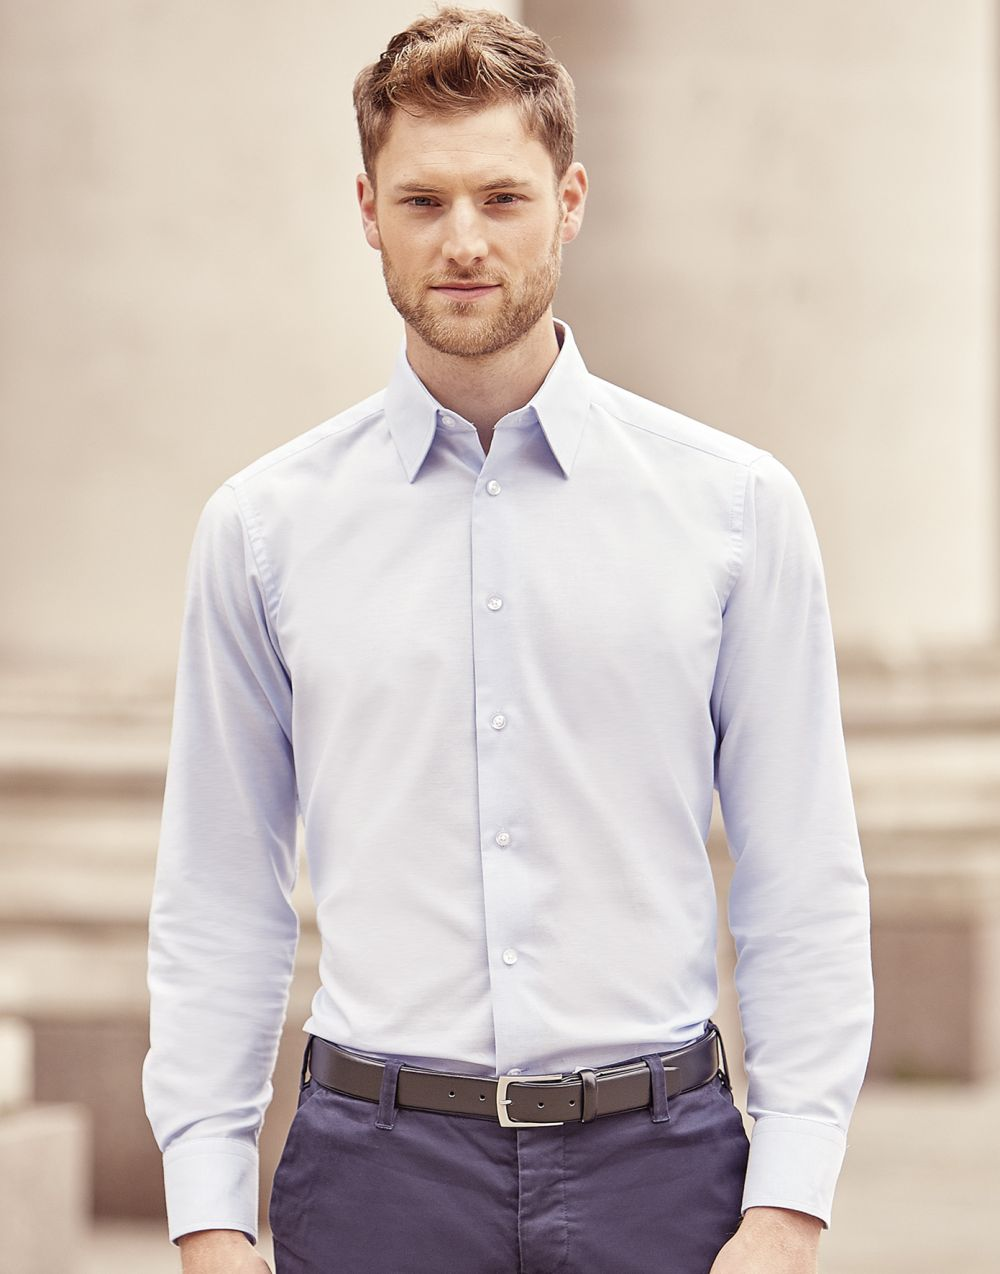 Camisas manga larga russell oxford de manga larga hombre para personalizar imagen 6